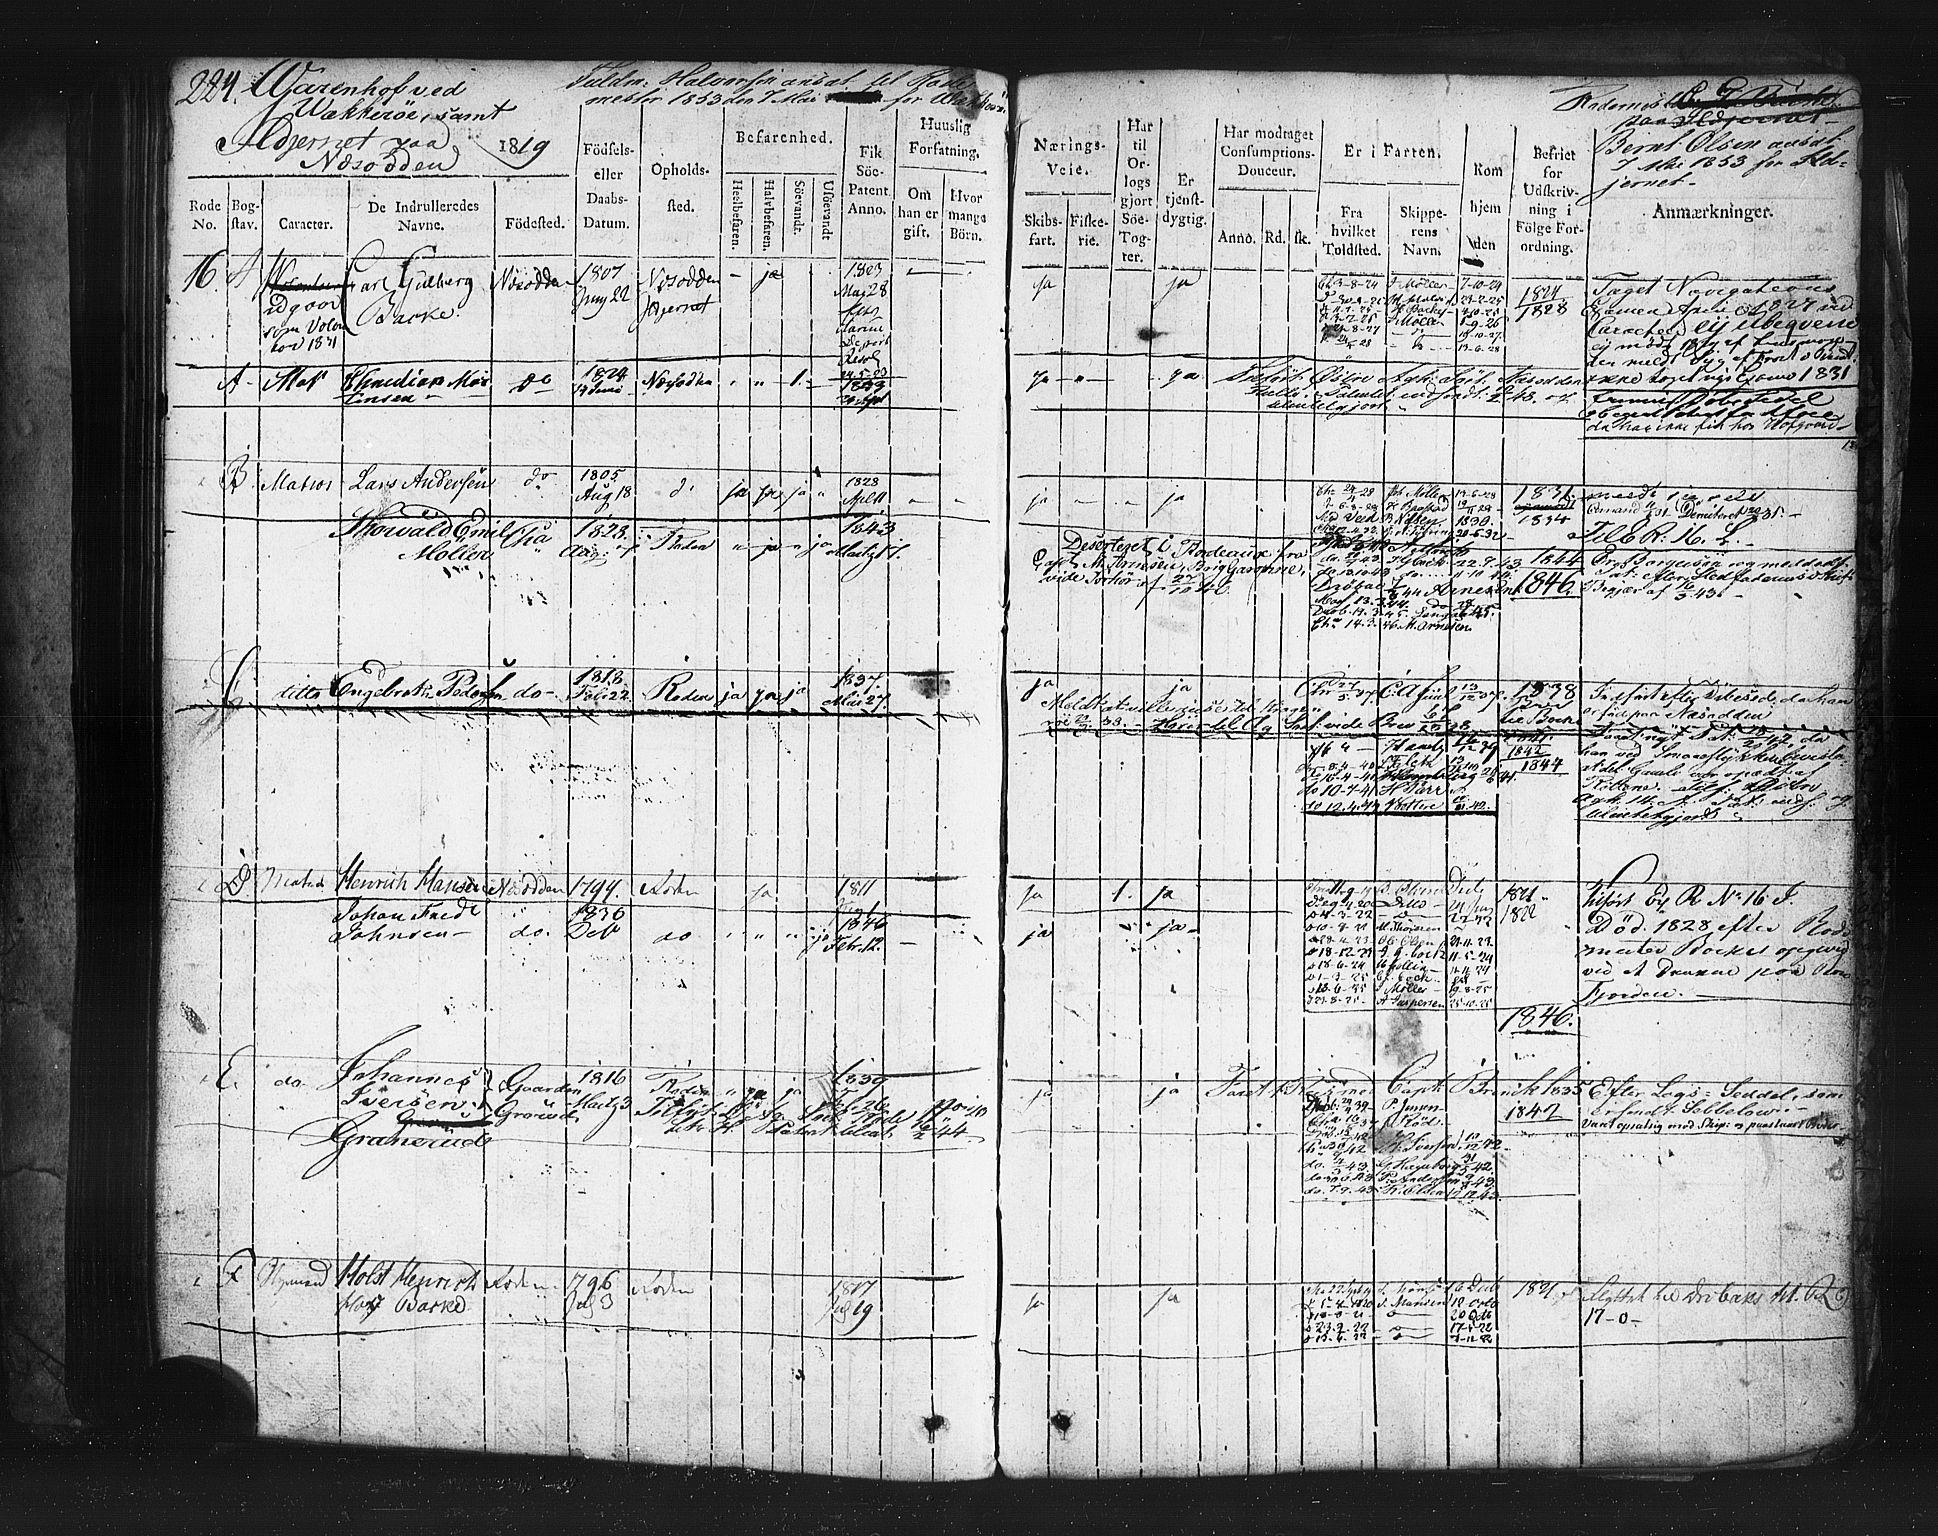 SAO, Oslo mønstringskontor, F/Fc/Fcb/L0001: Hovedrulle, 1819, s. 224